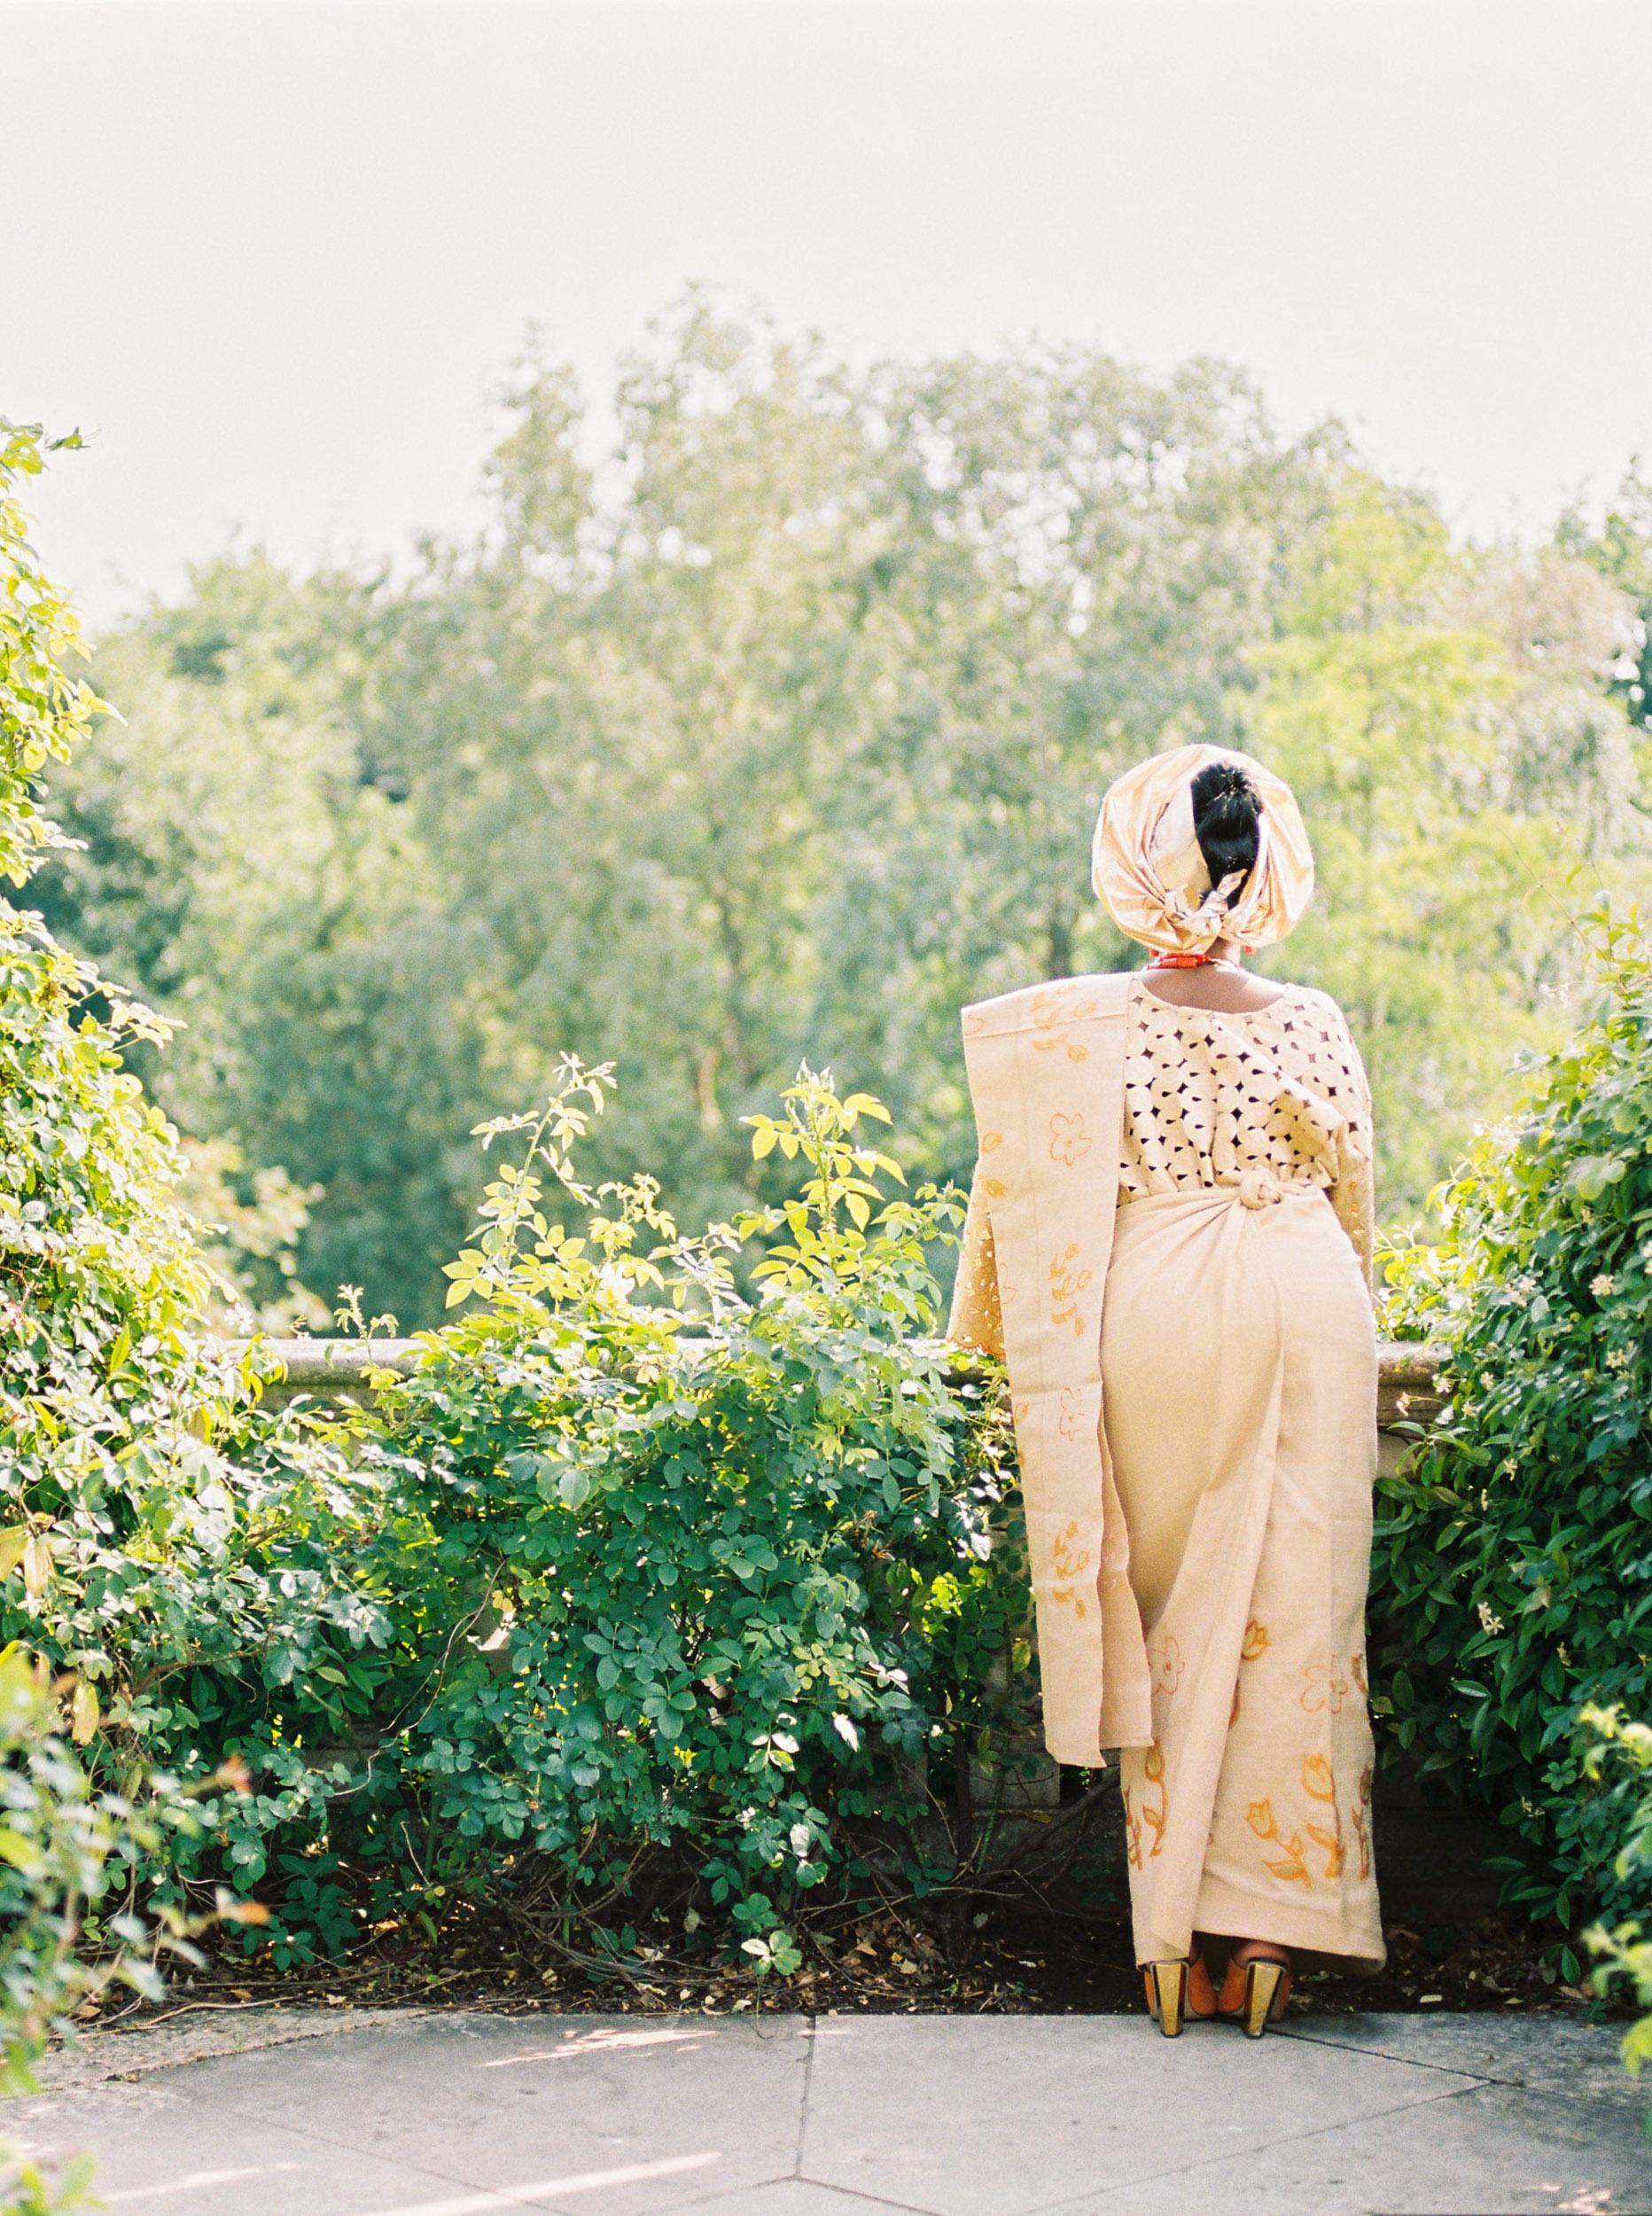 Amy O'Boyle Photography- Destination & UK Fine Art Film Wedding Photographer- The Pergola and Hill Garden Wedding-22.jpg